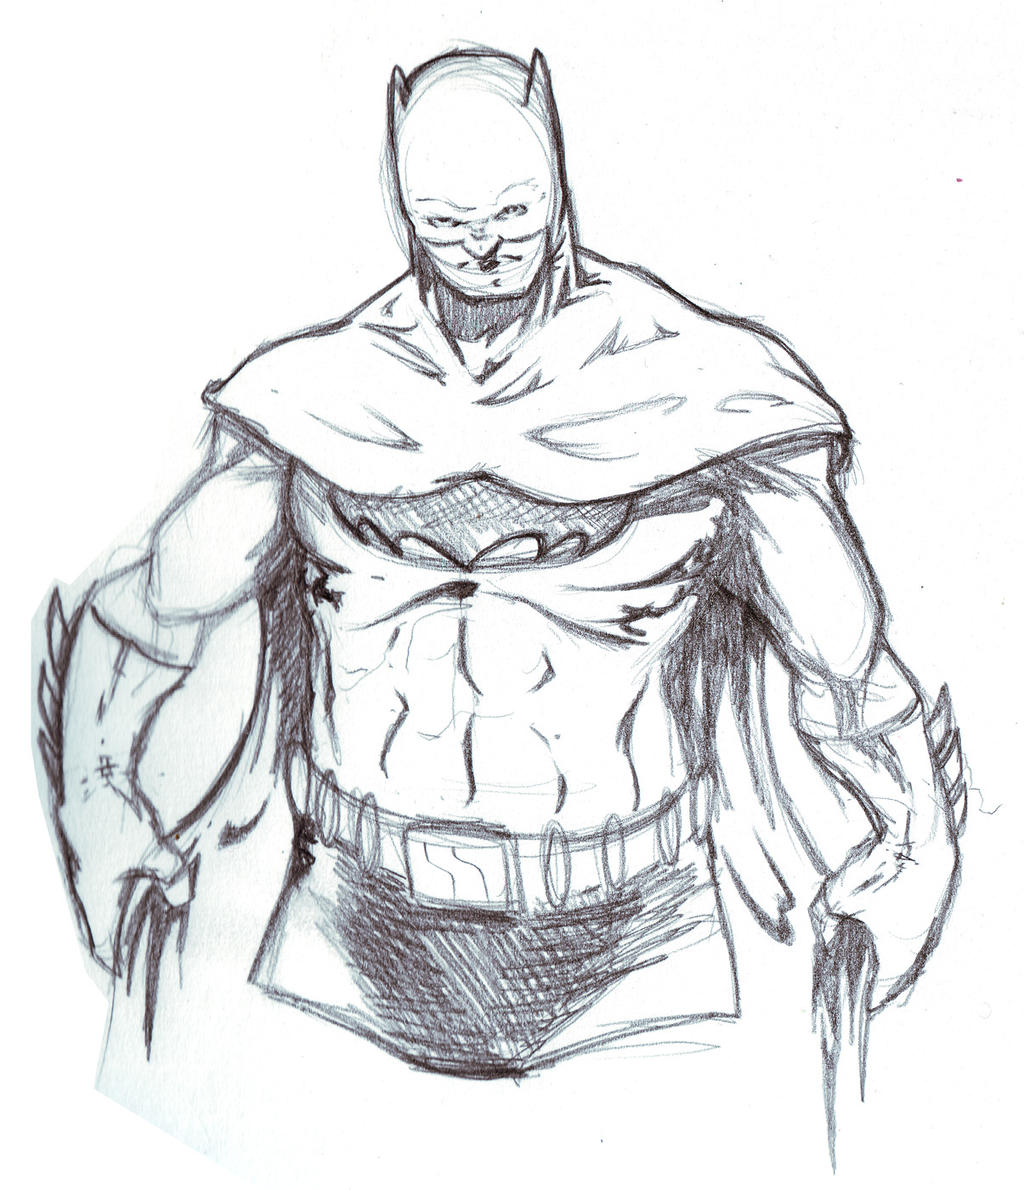 Batman pencil Sketch 15 min by MDMacKay on DeviantArt Batman Drawing In Pencil Easy